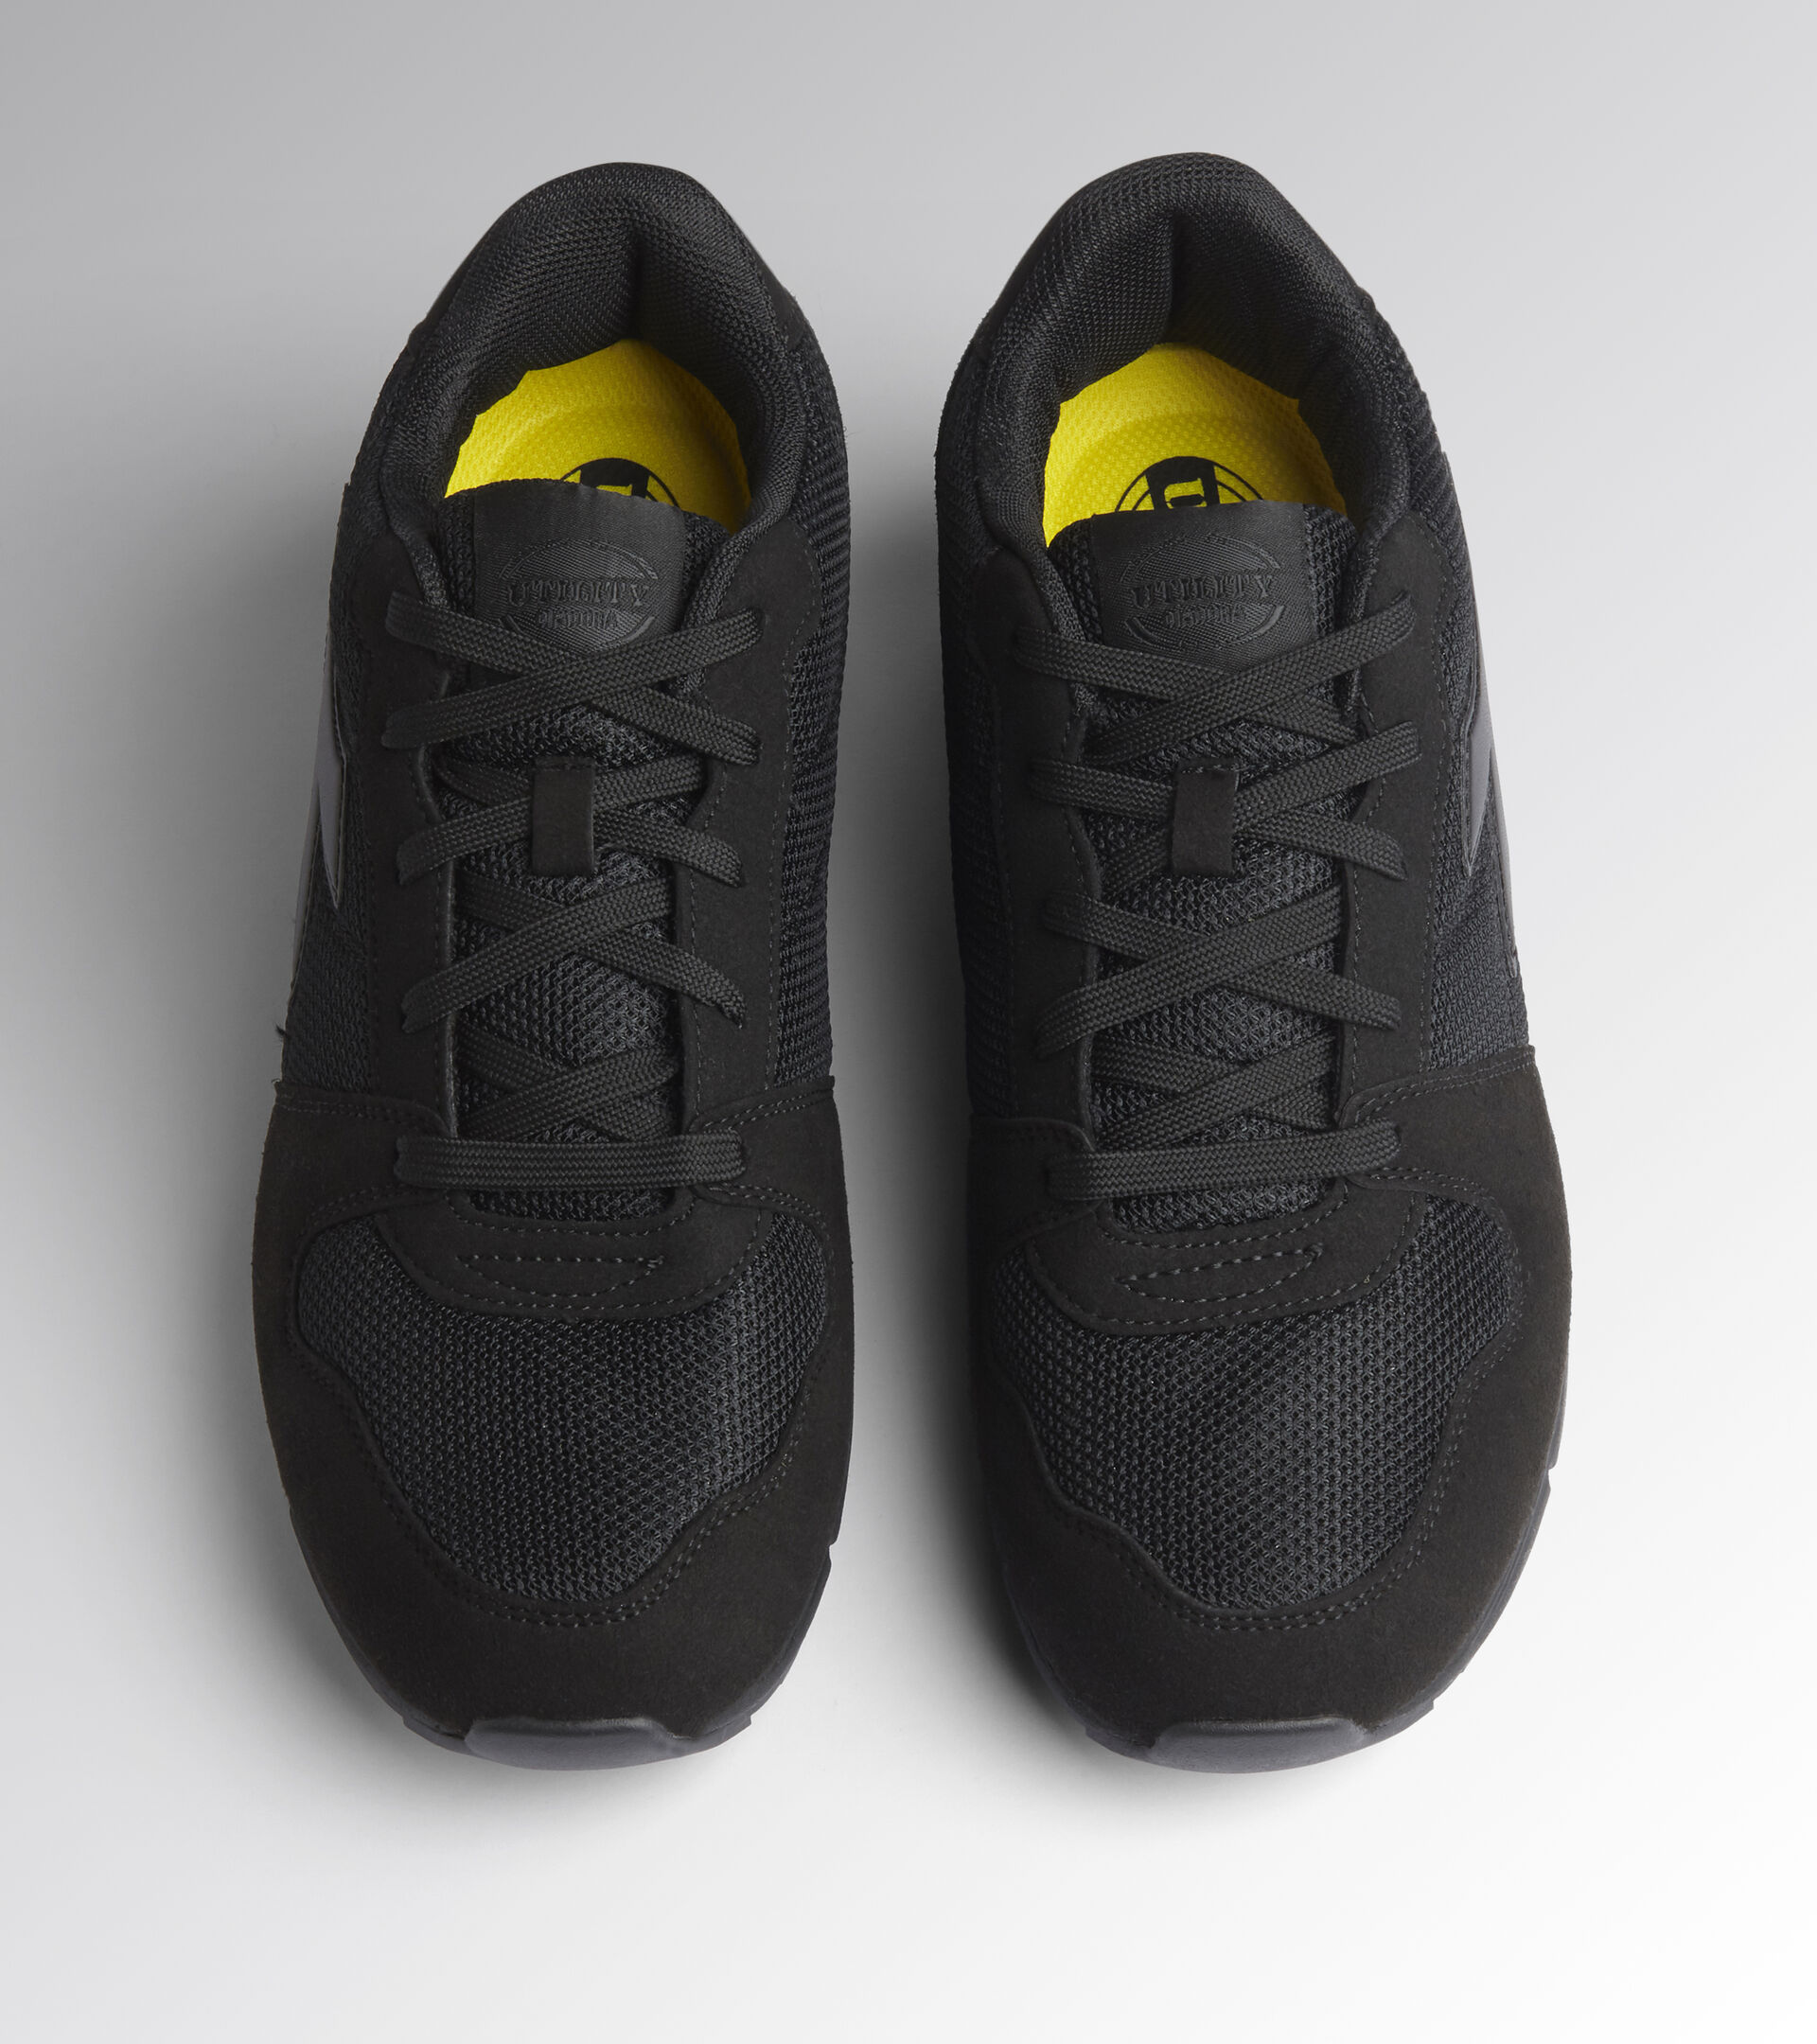 Footwear Utility UNISEX CREW MICROMESH OB SRC BLACK Utility